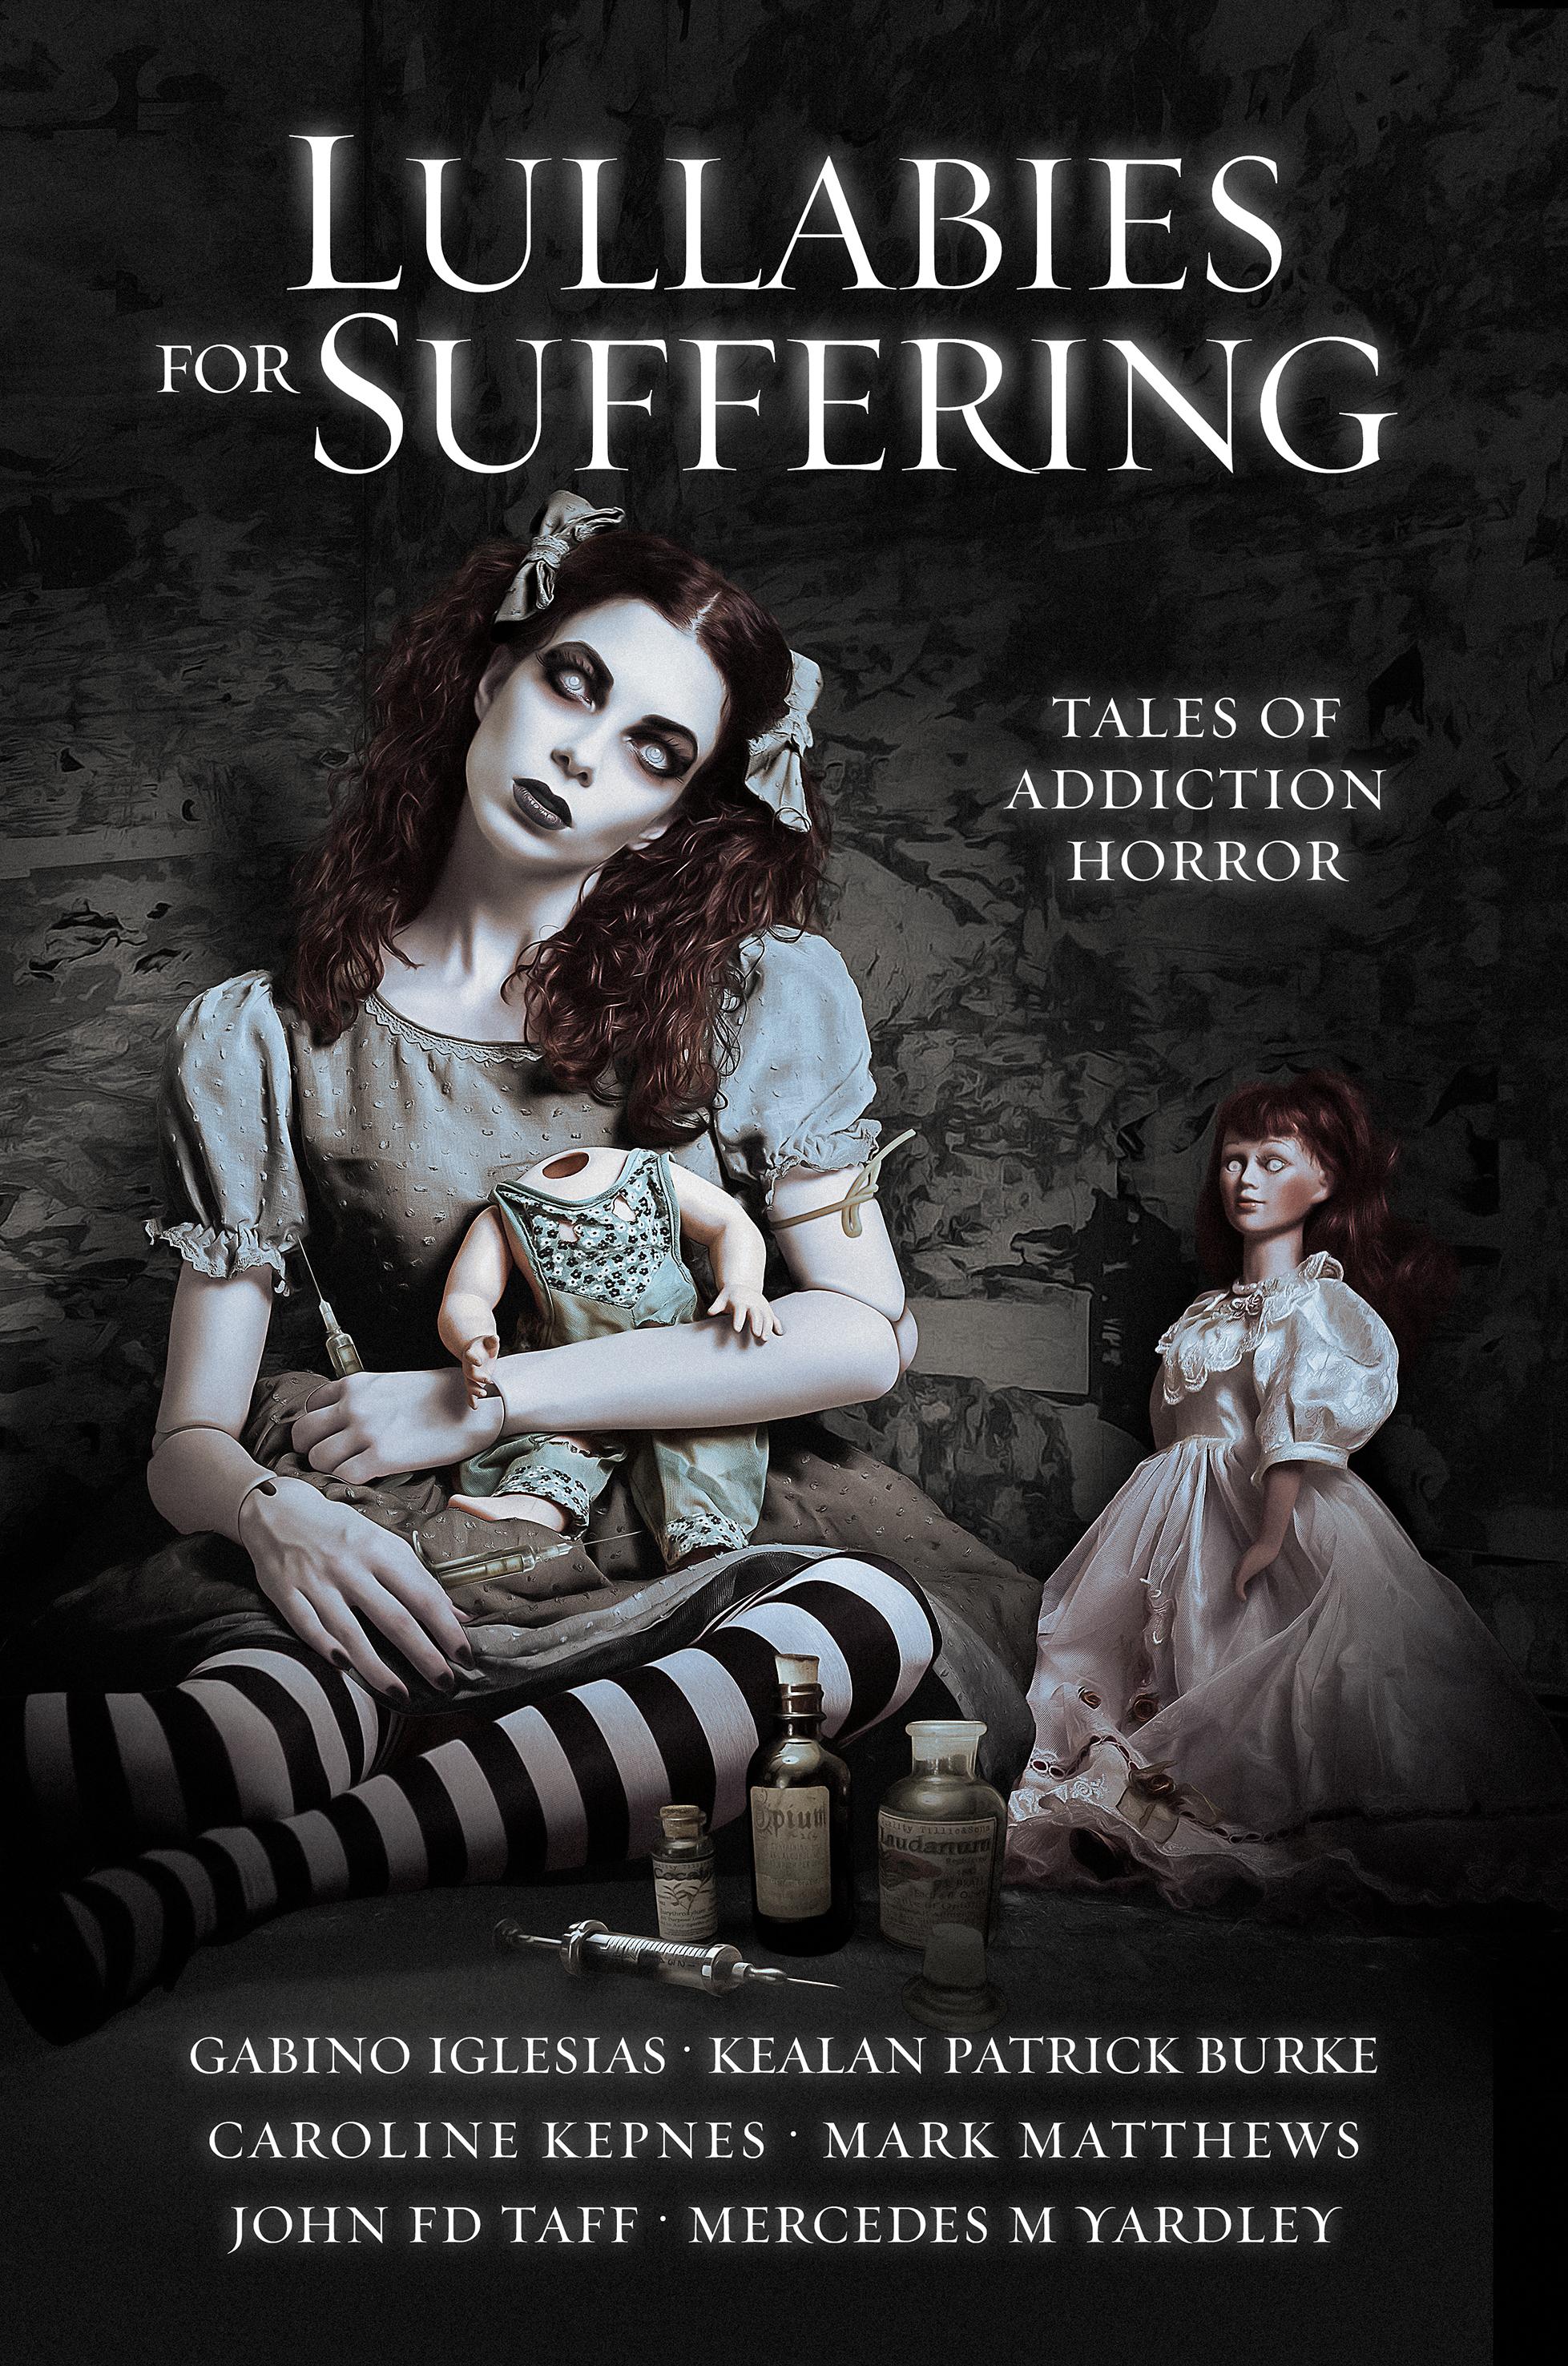 Lullabies for Suffering: Tales of Addiction Horror by Caroline Kepnes, Gabino Iglesias, John F.D. Taff, Mercedes M. Yardley, Mark Matthews, Kealan Patrick Burke